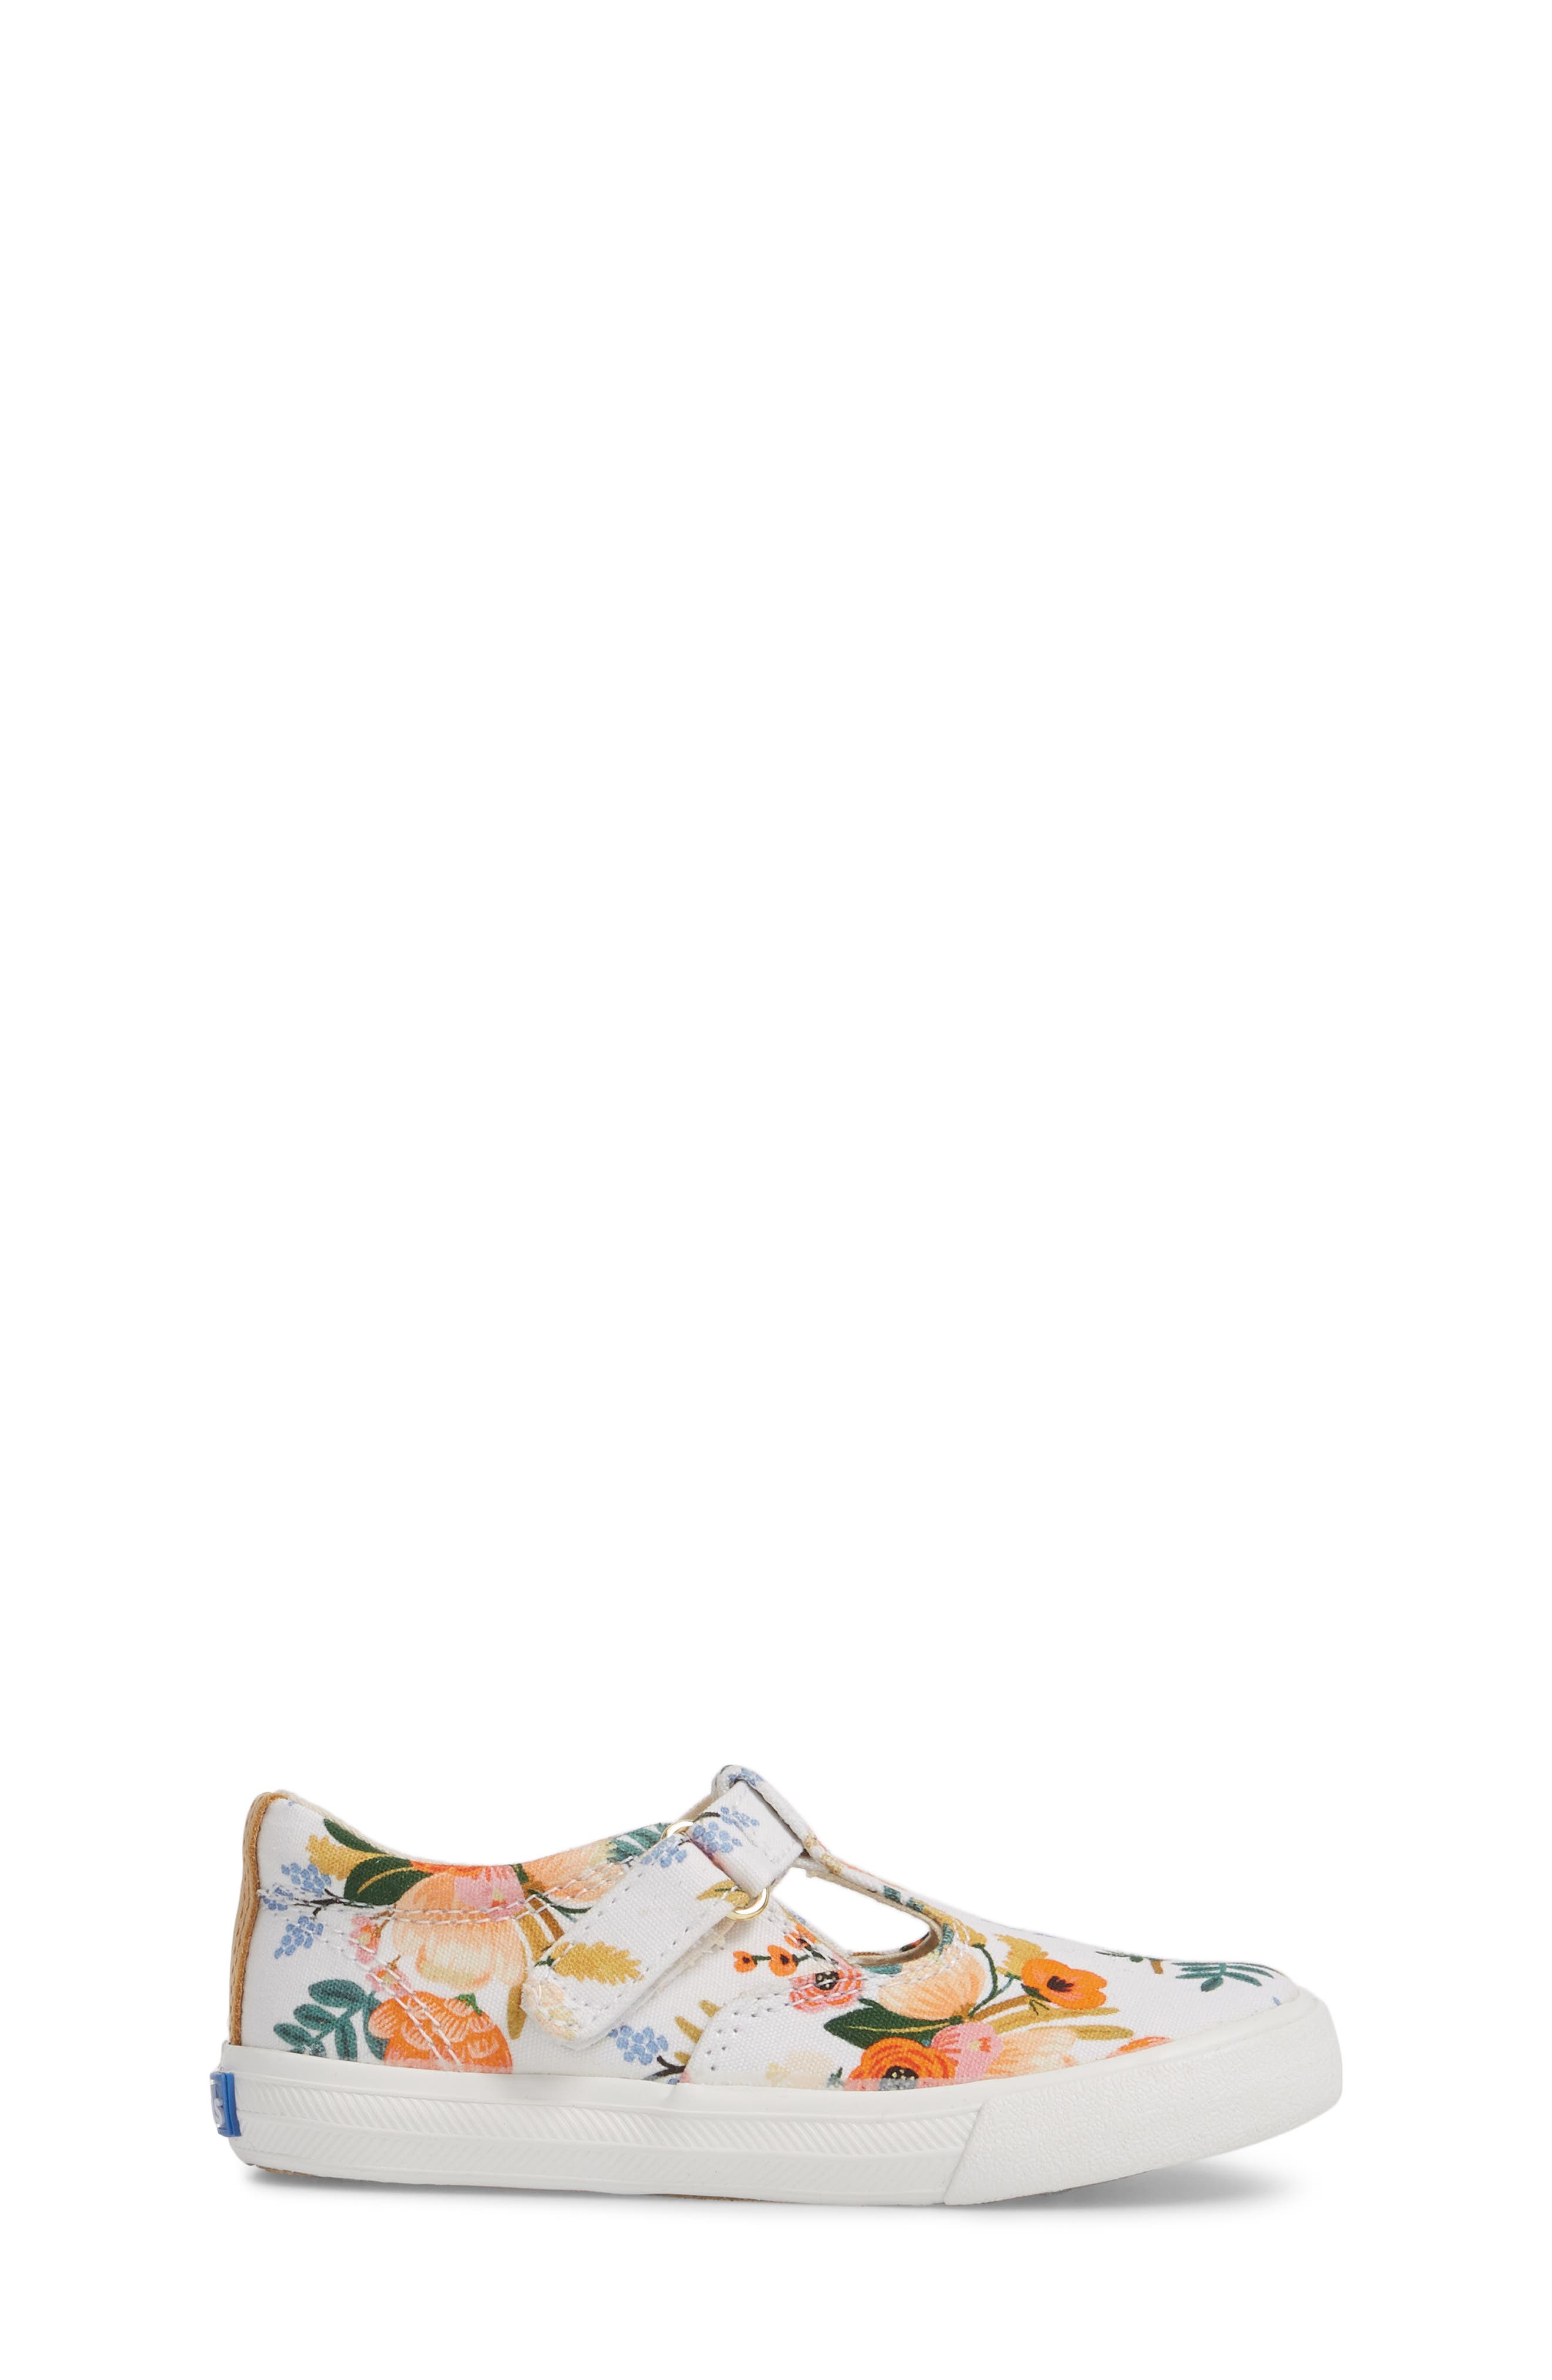 Daphne T-Strap,                             Alternate thumbnail 3, color,                             Lively White